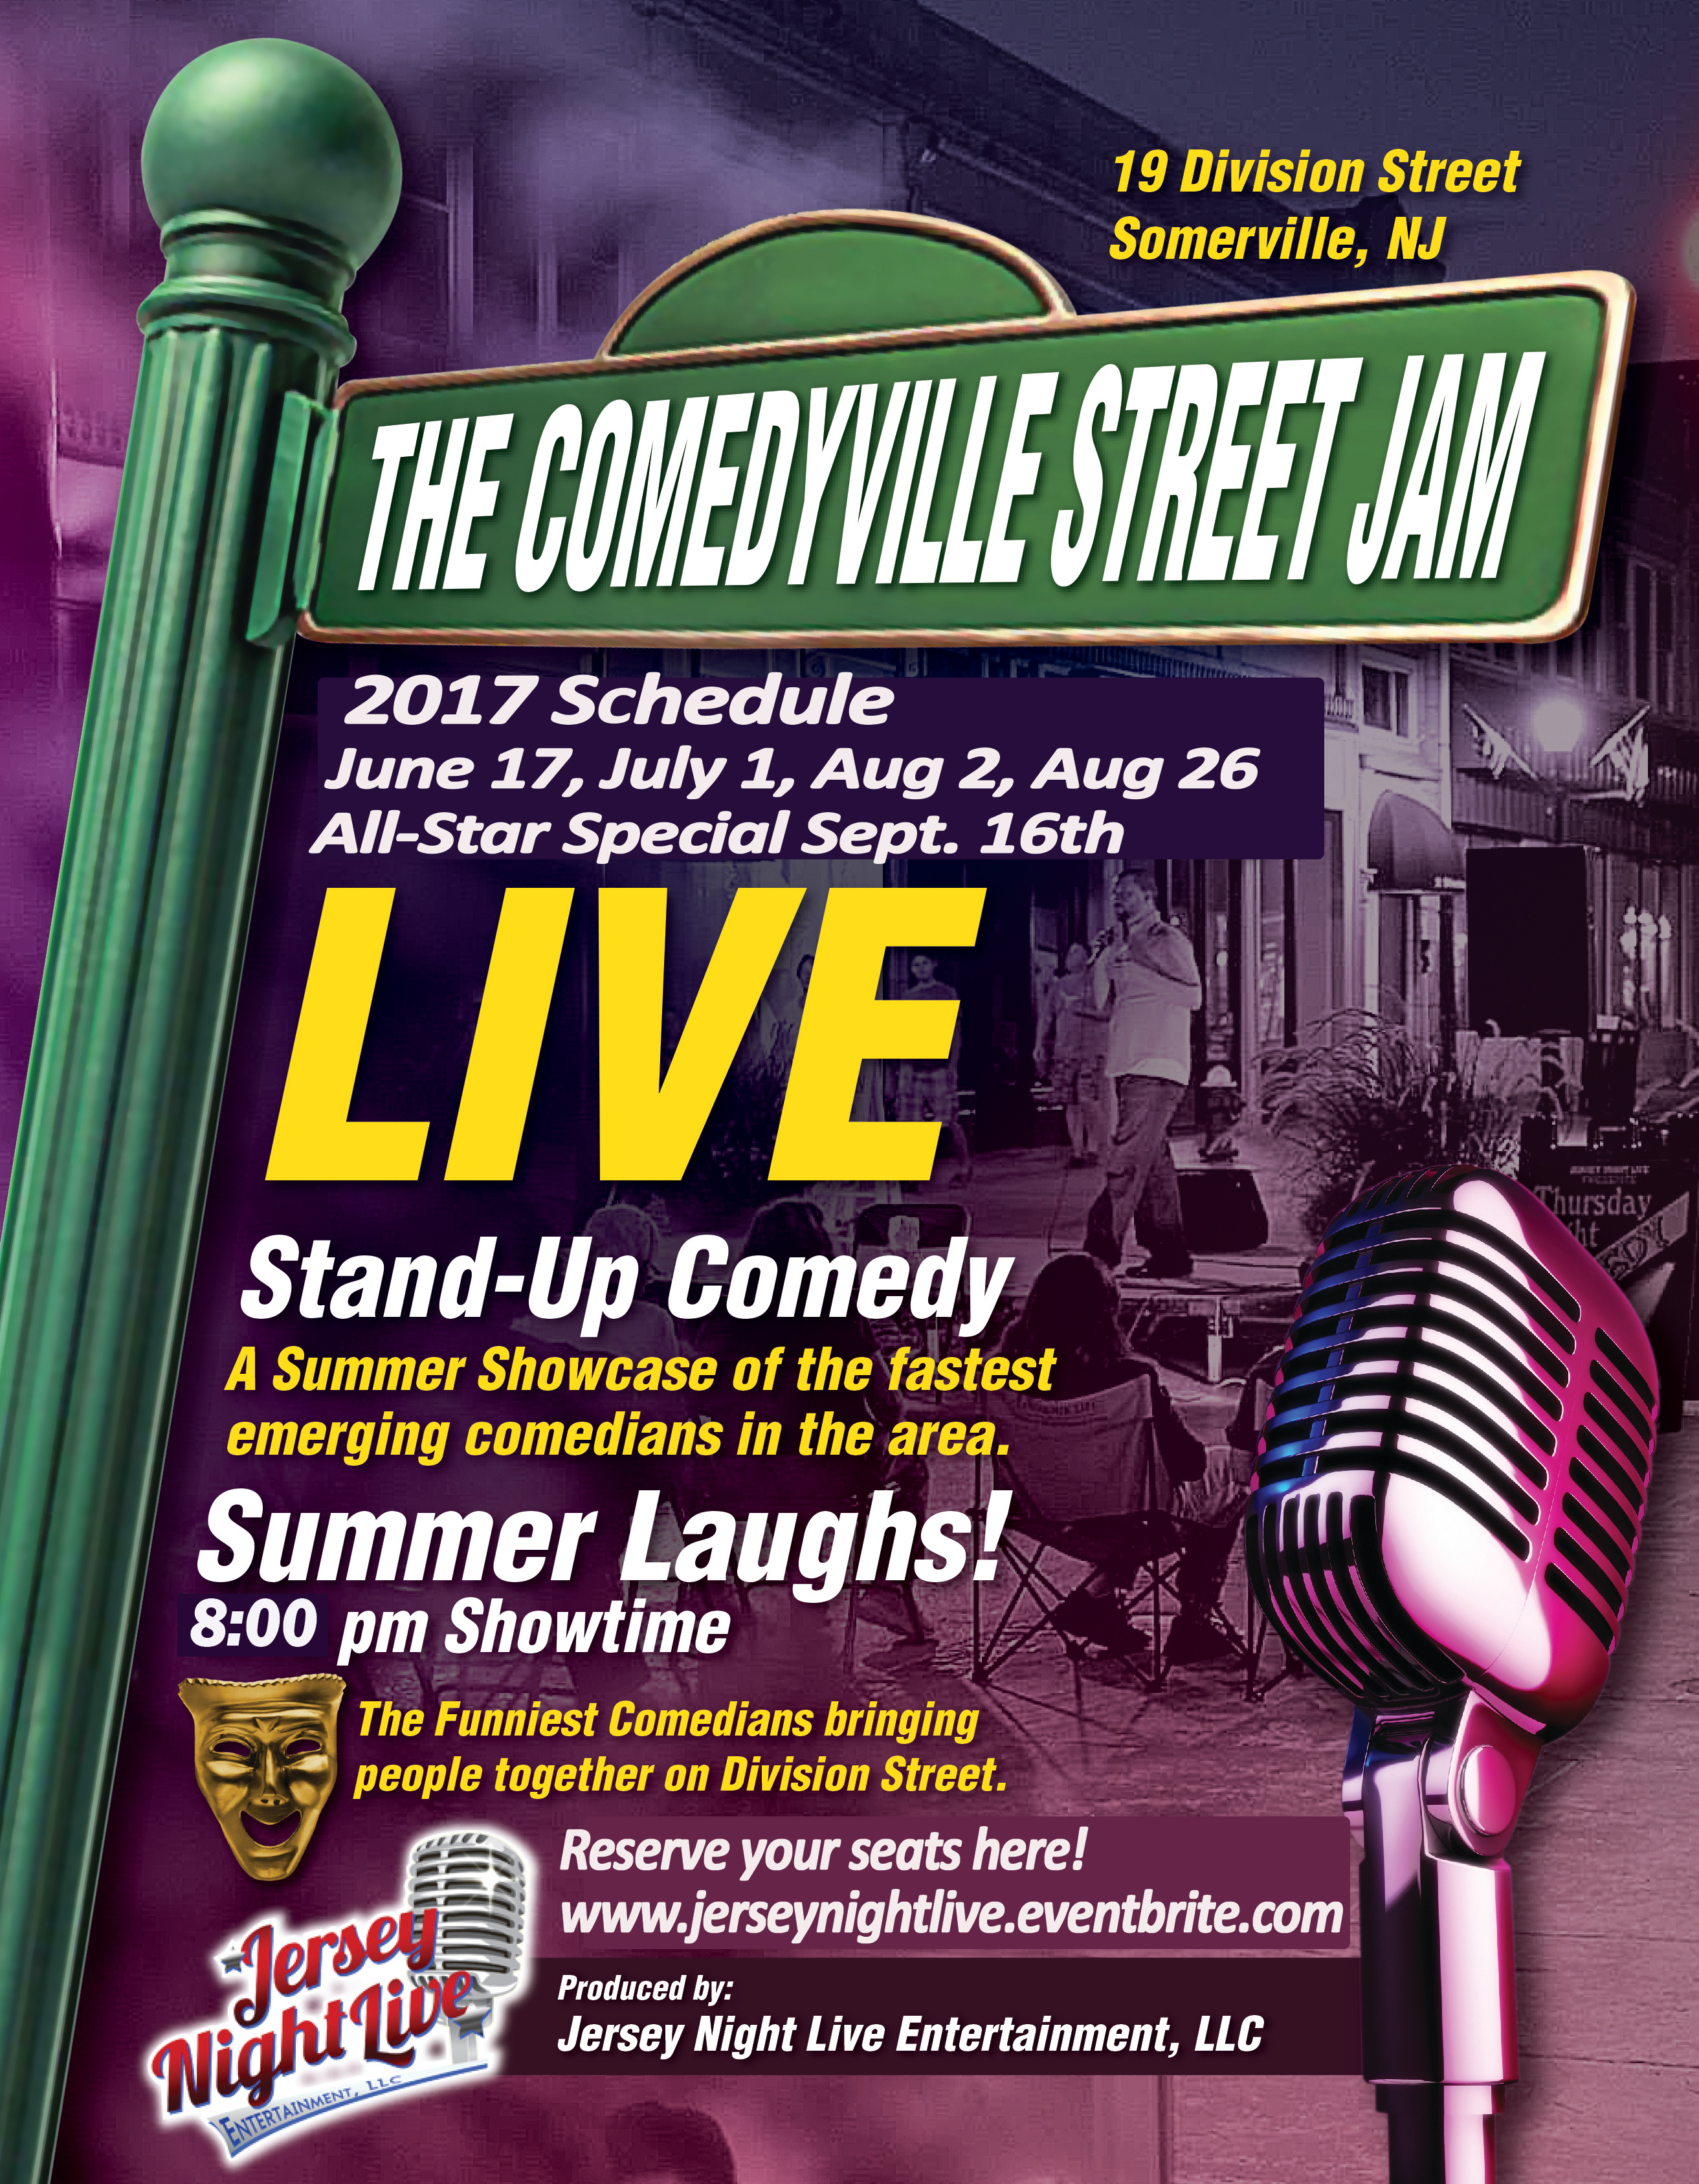 Comedyville Street Flyer -2017-Season-5.2